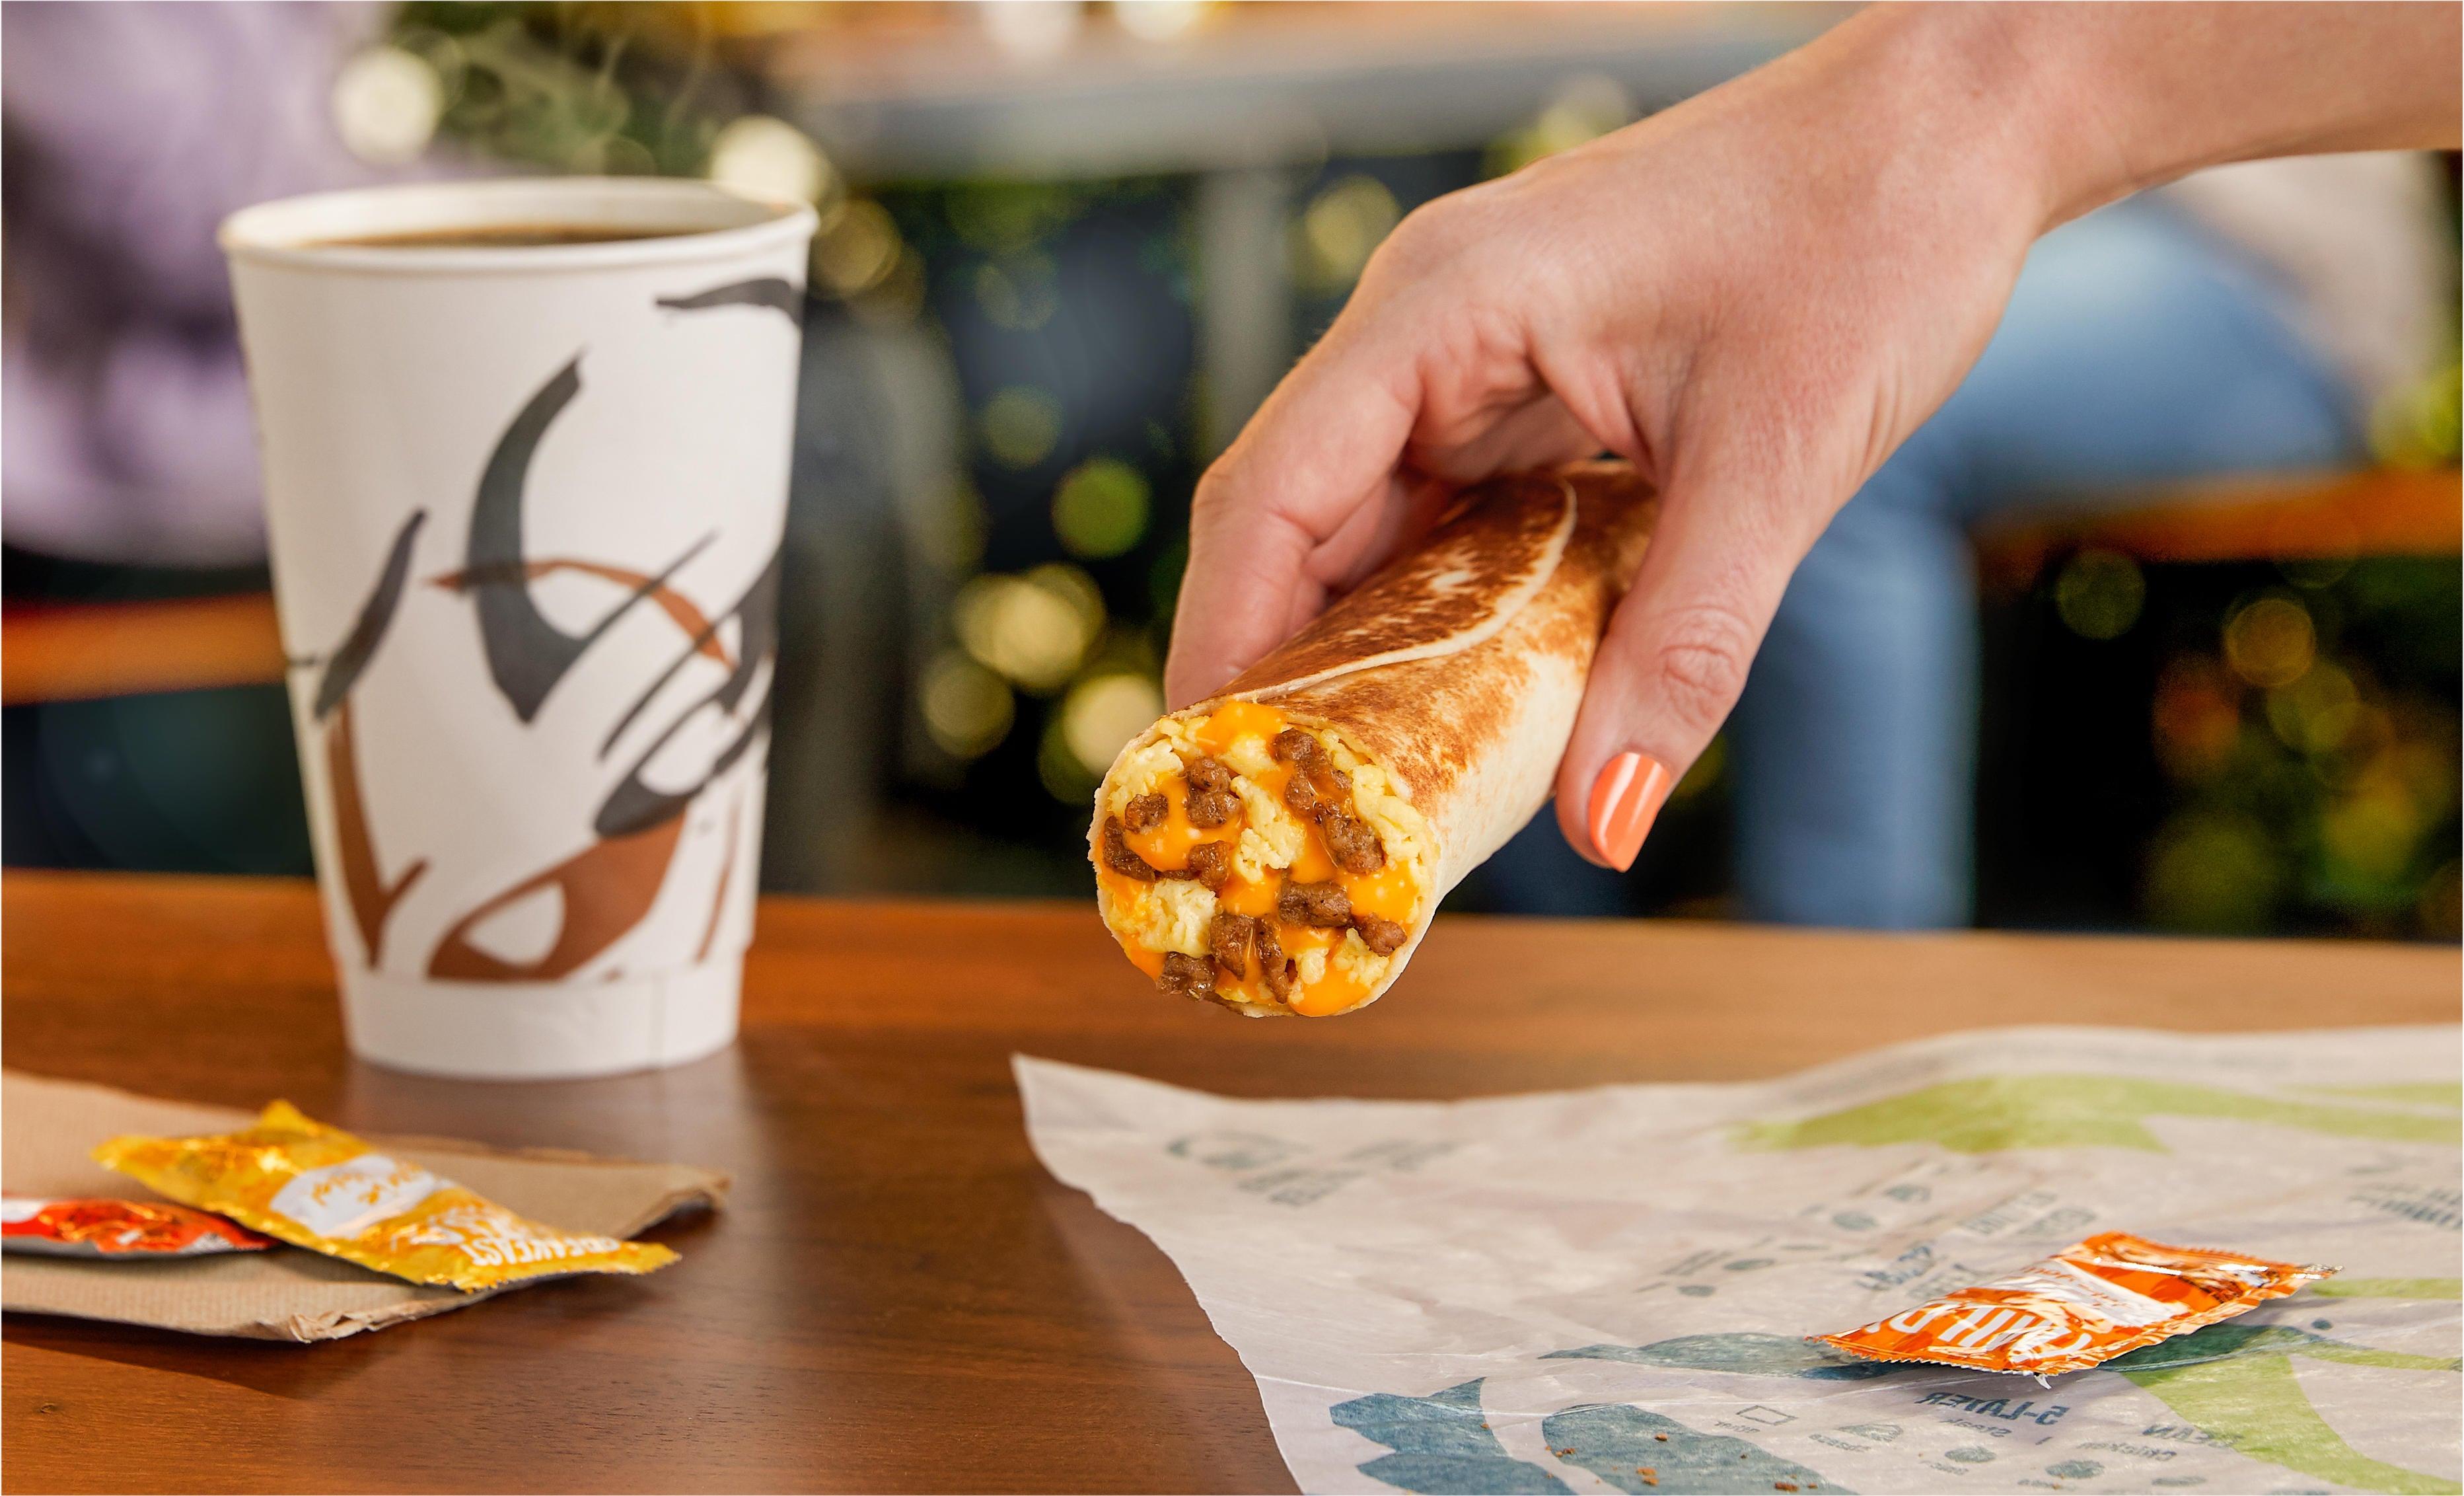 cheesy-sausage-toasted-breakfast-burrito